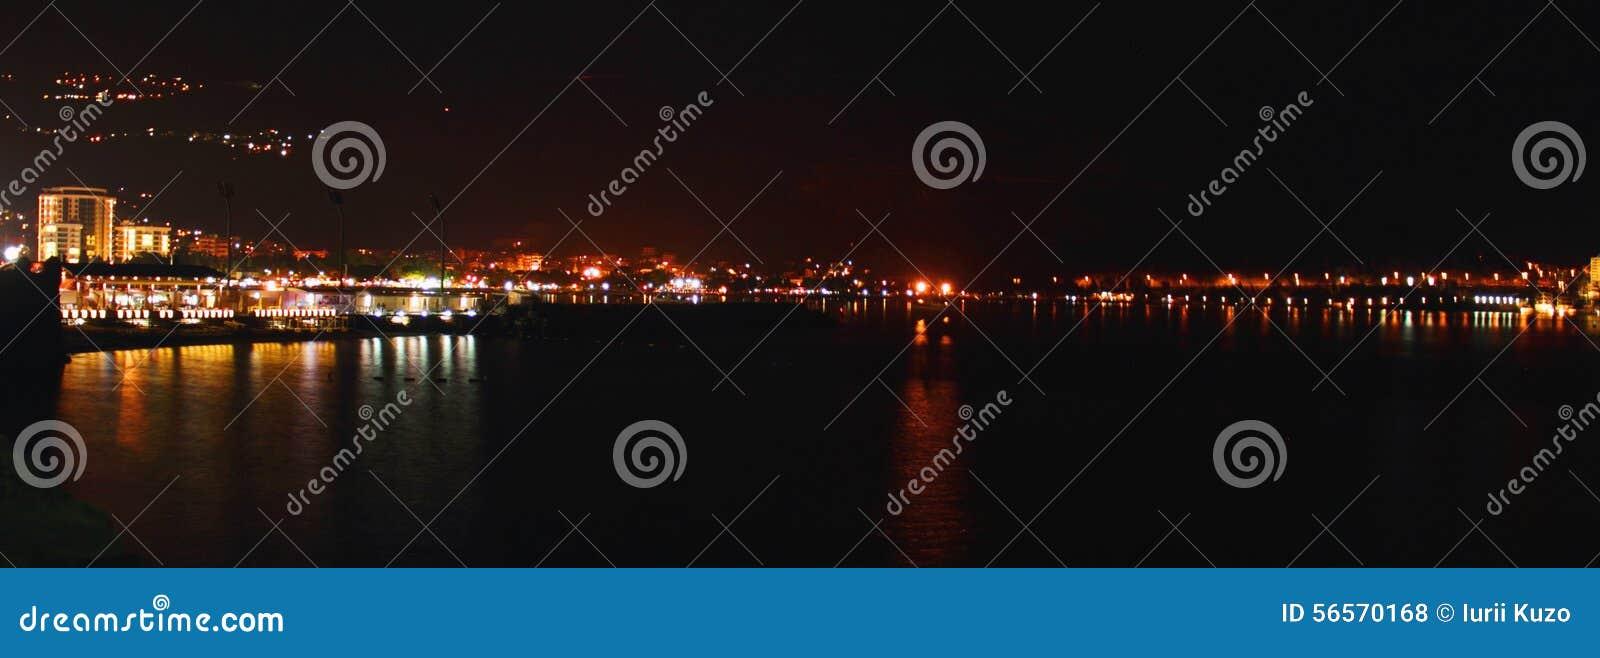 Download Λιμένας πόλεων του $ροστόκ τή νύχτα, Γερμανία Στοκ Εικόνες - εικόνα από balminess, αντανάκλαση: 56570168